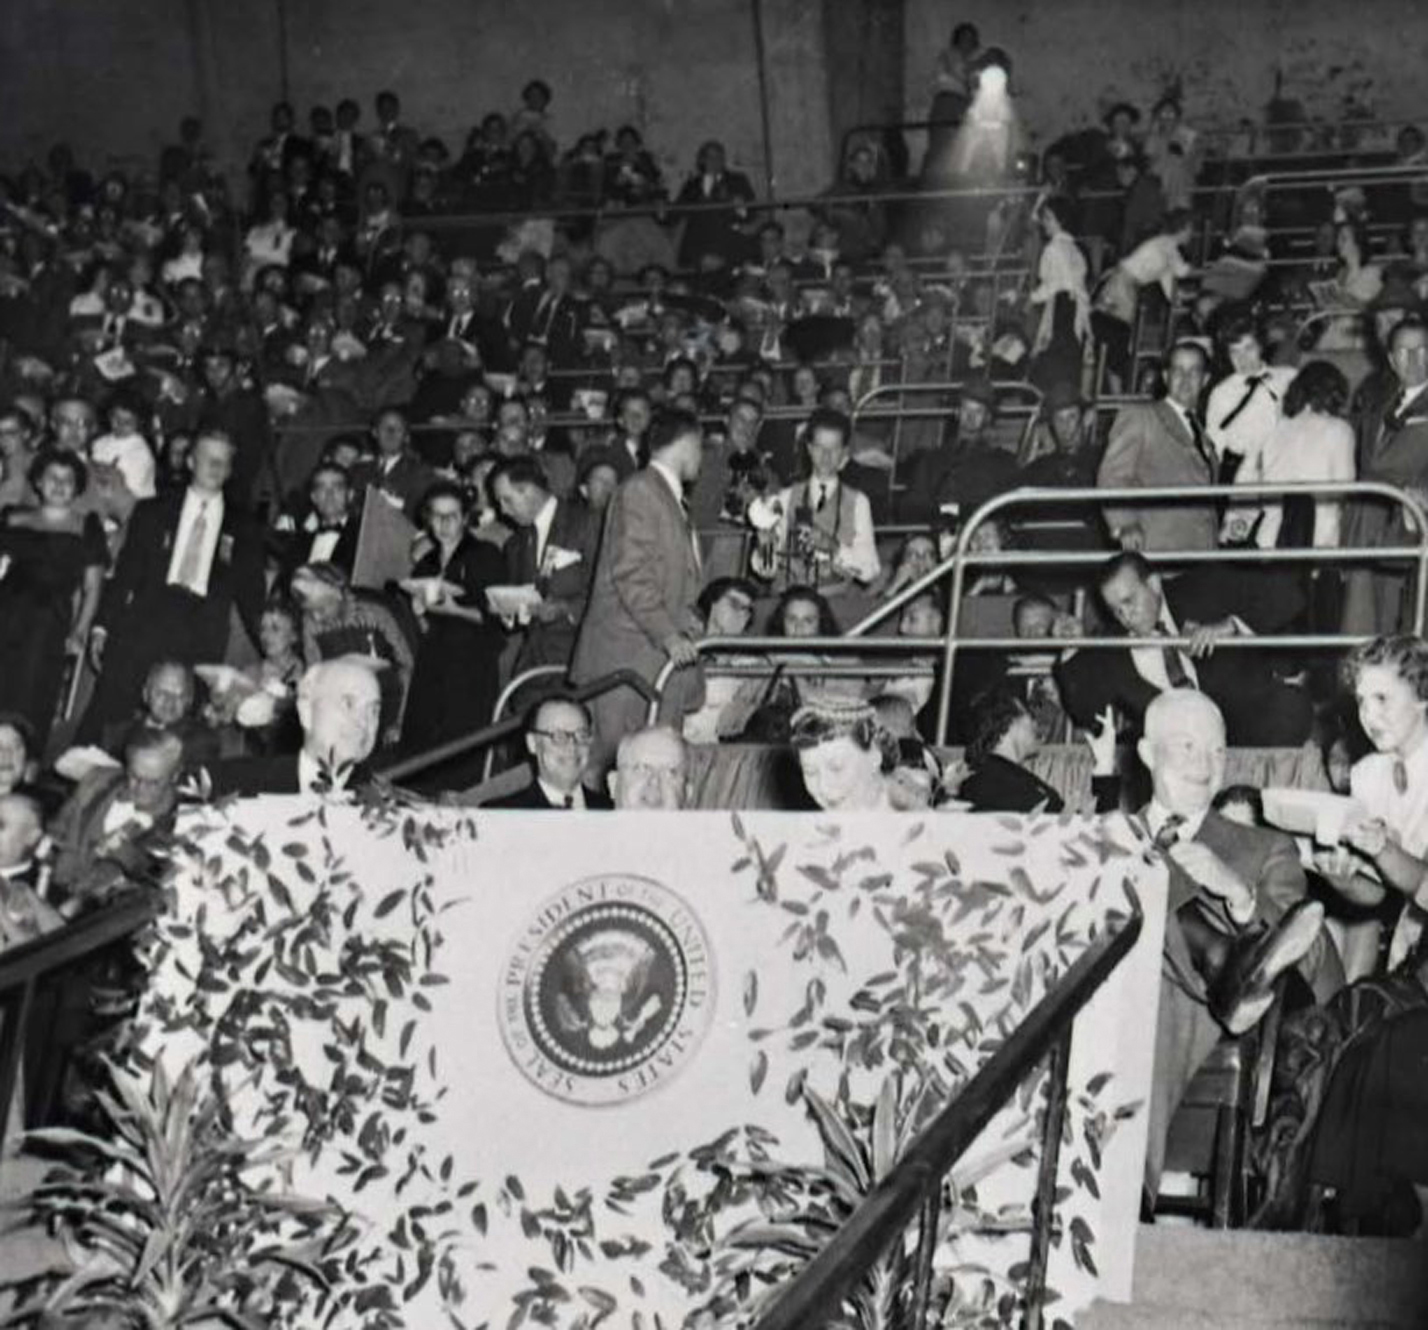 President Eisenhower S Visit To Hershey On October 13